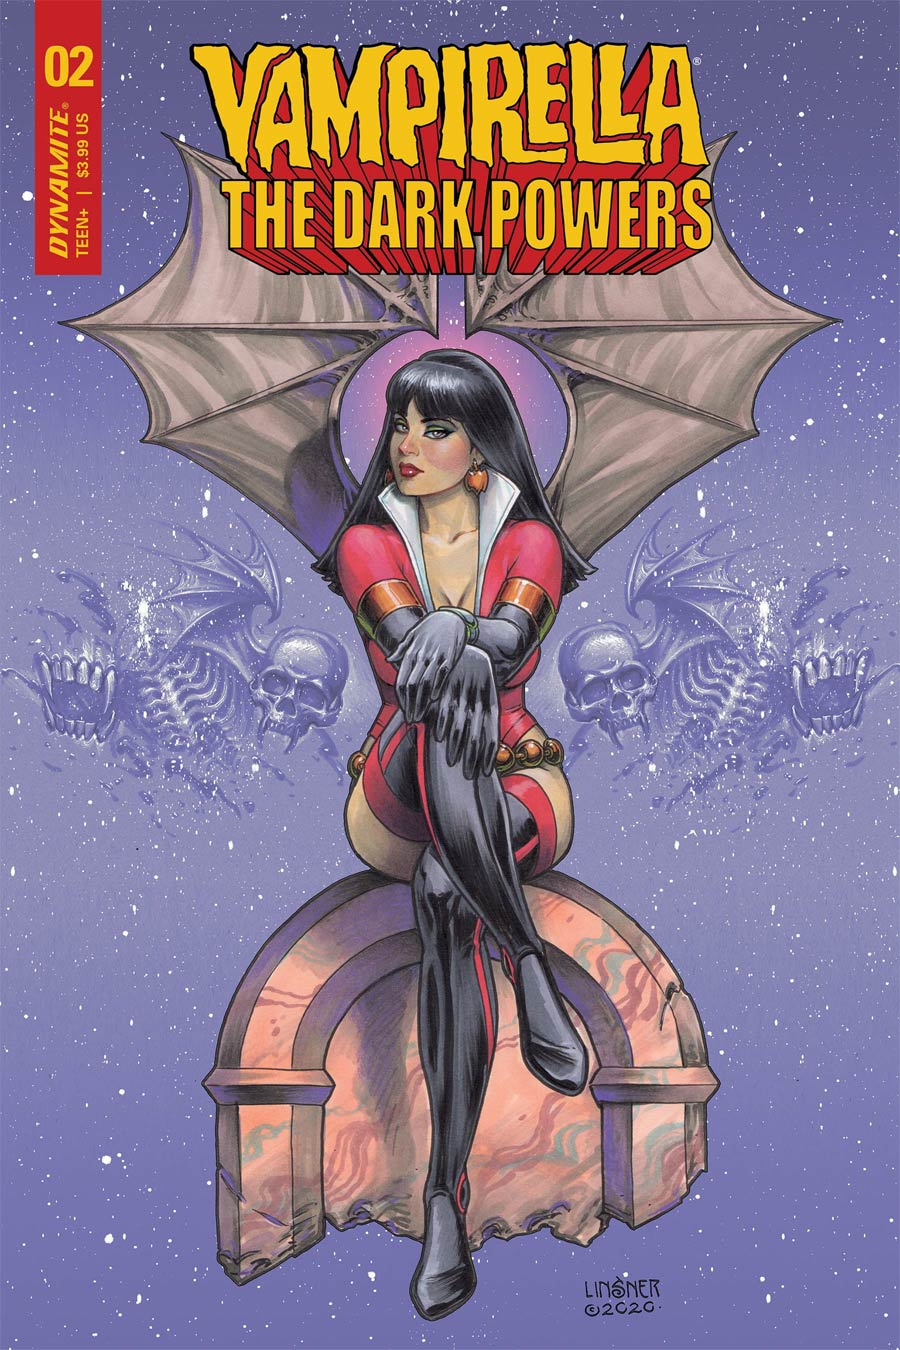 Vampirella The Dark Powers #2 Cover Z-D Variant Joseph Michael Linsner Cover CGC Graded